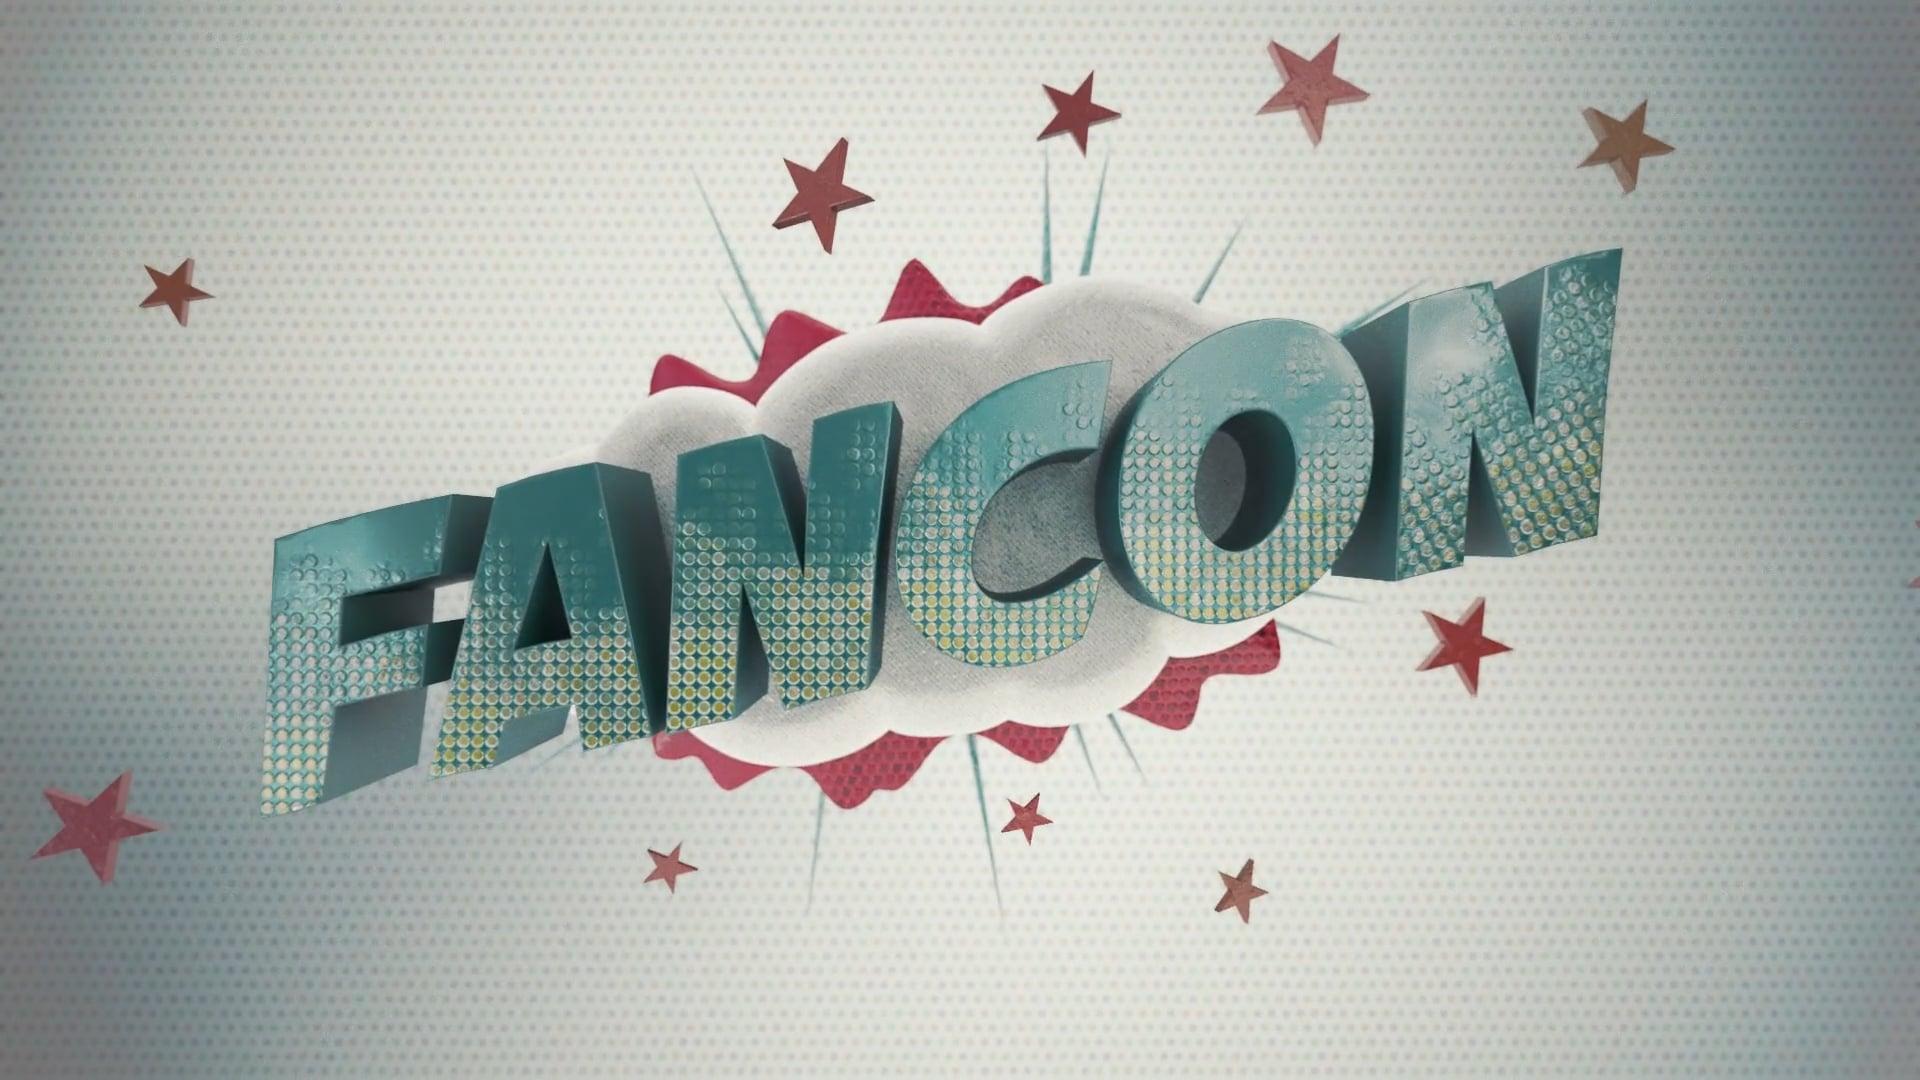 Fancon - Animation Fest 2017 Intro